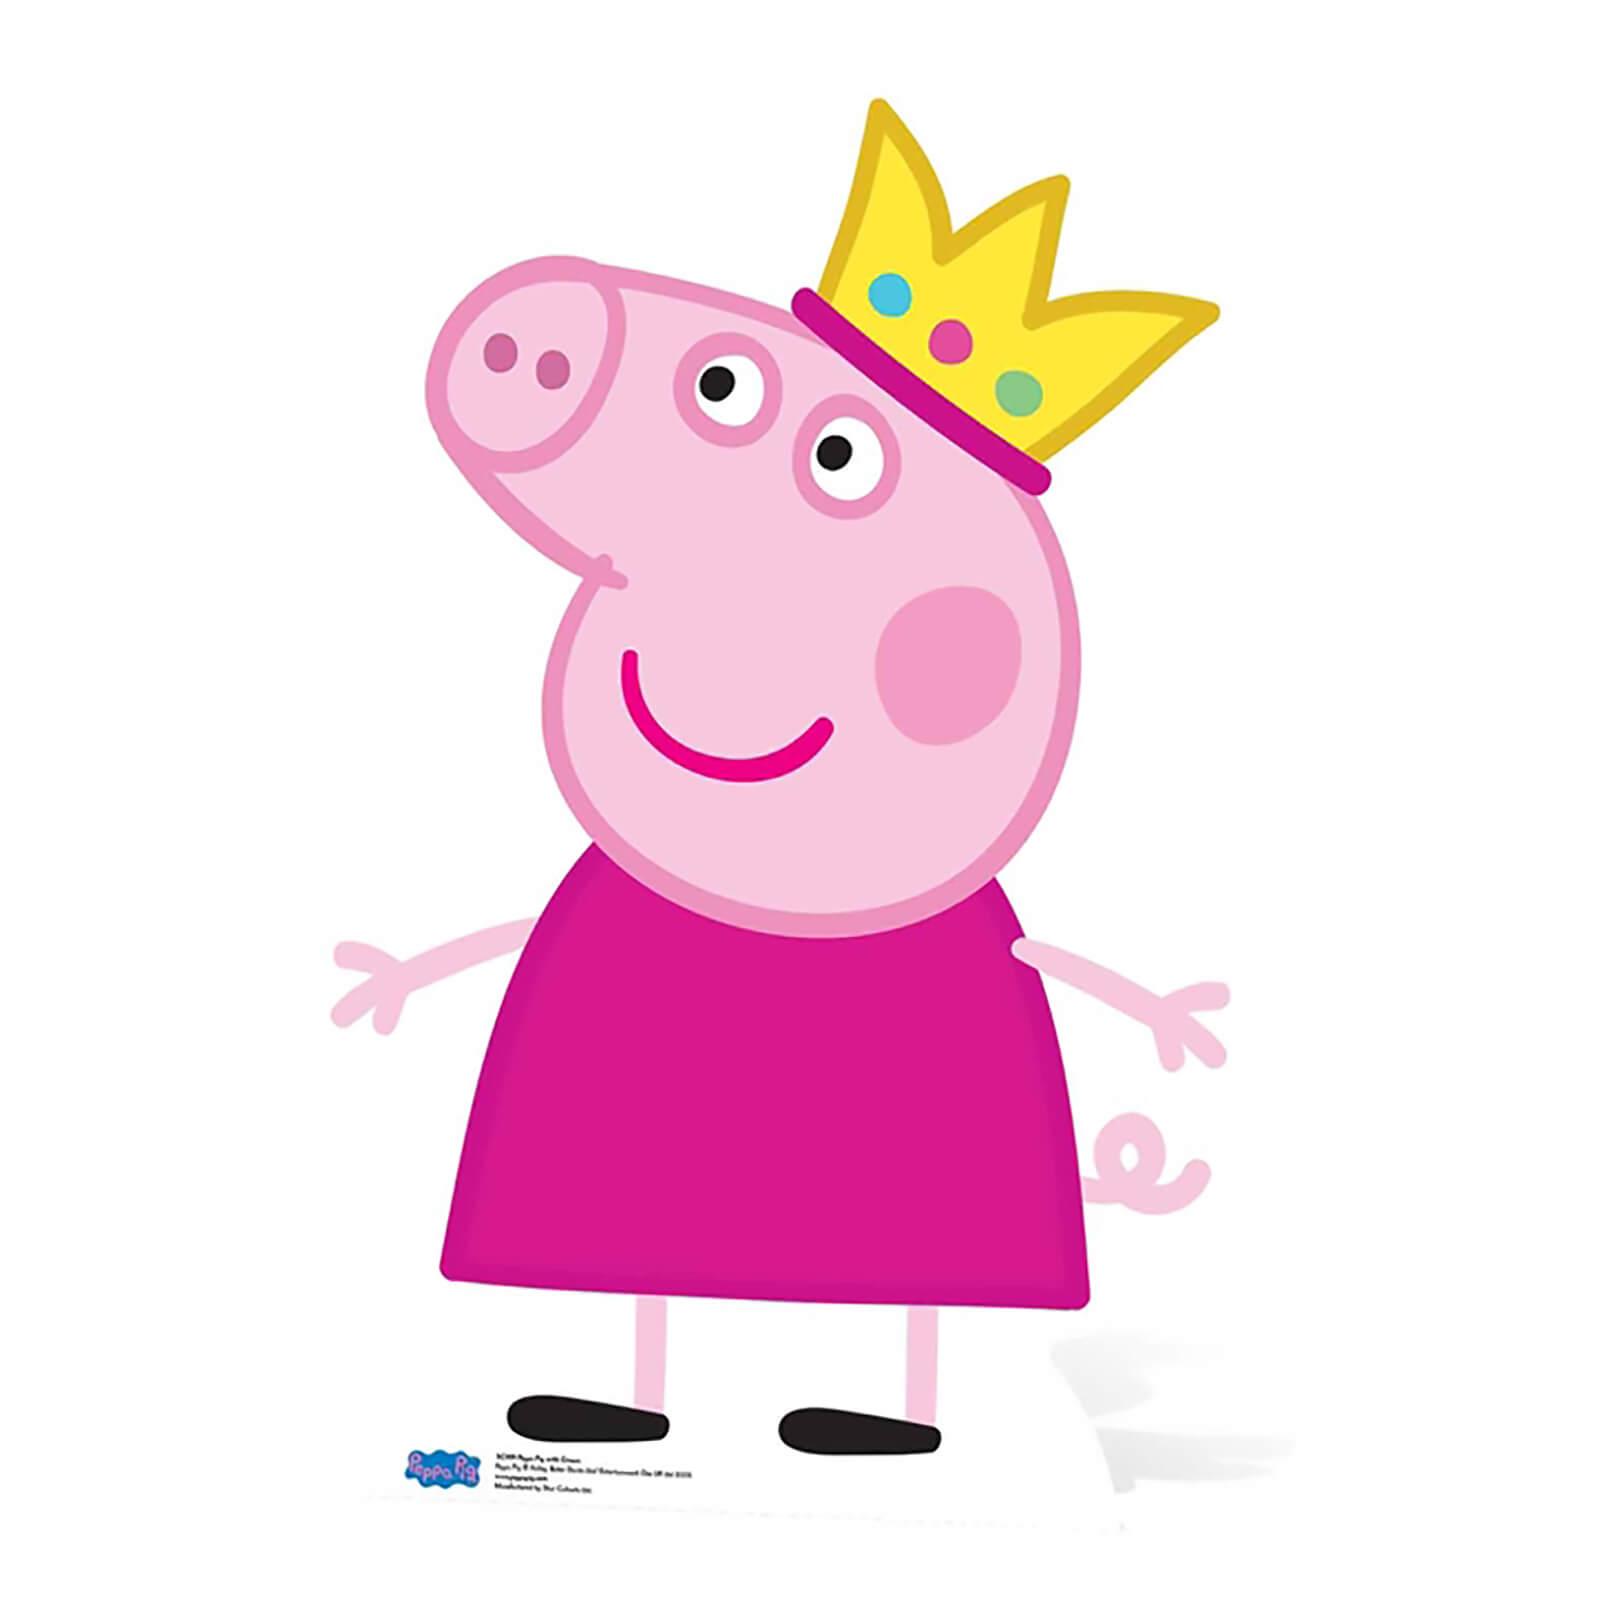 Peppa Pig Peppa Pig Crown Lifesize Cardboard Cut Out